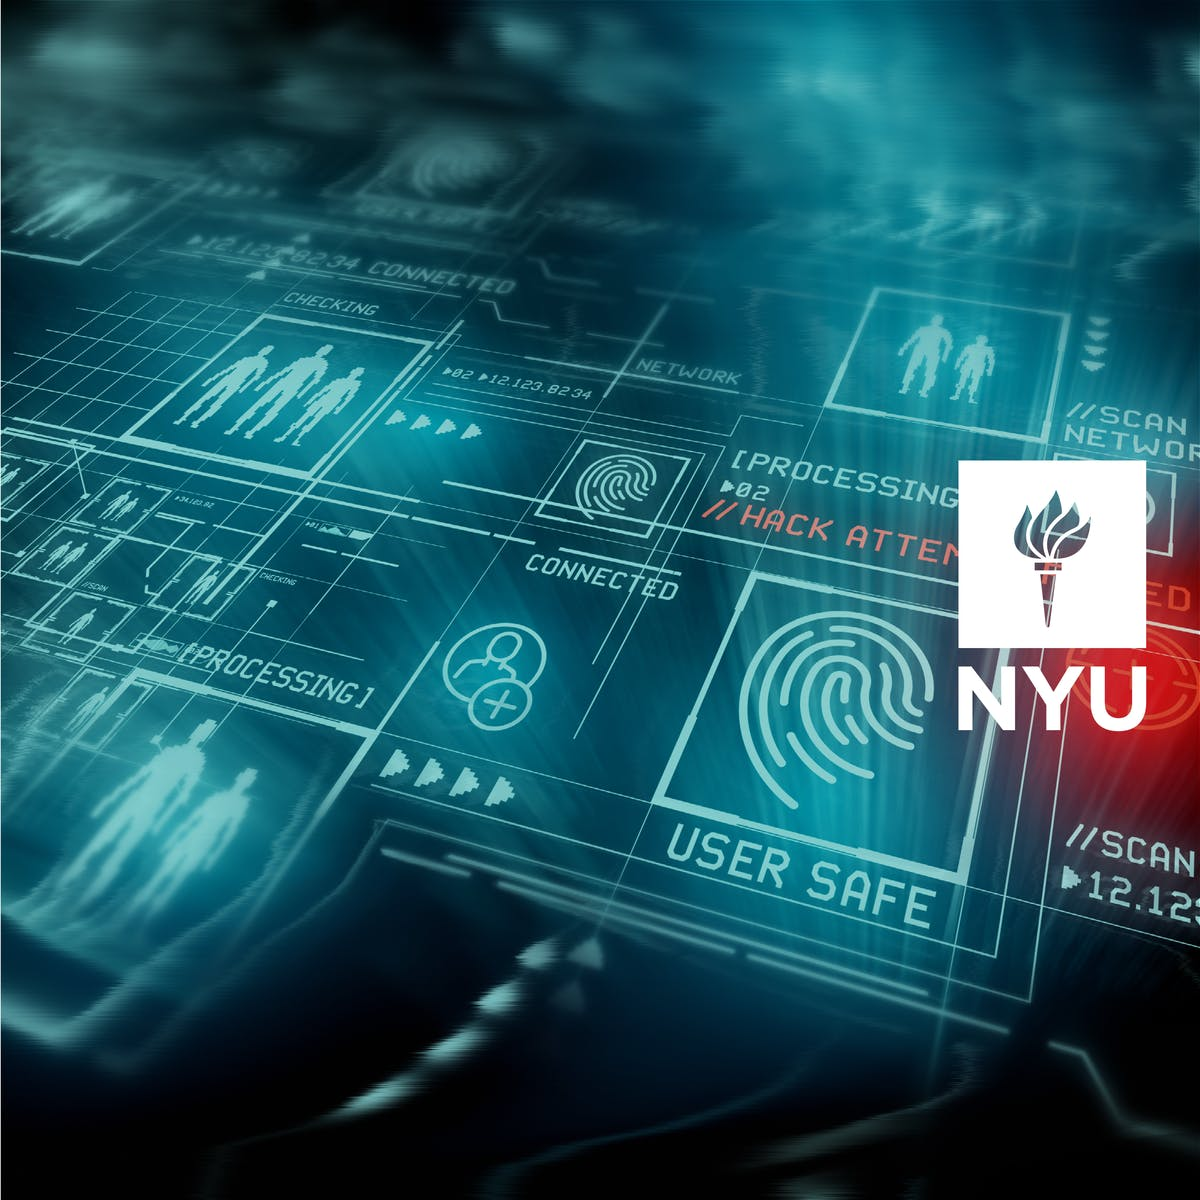 Cyber Attack Countermeasures